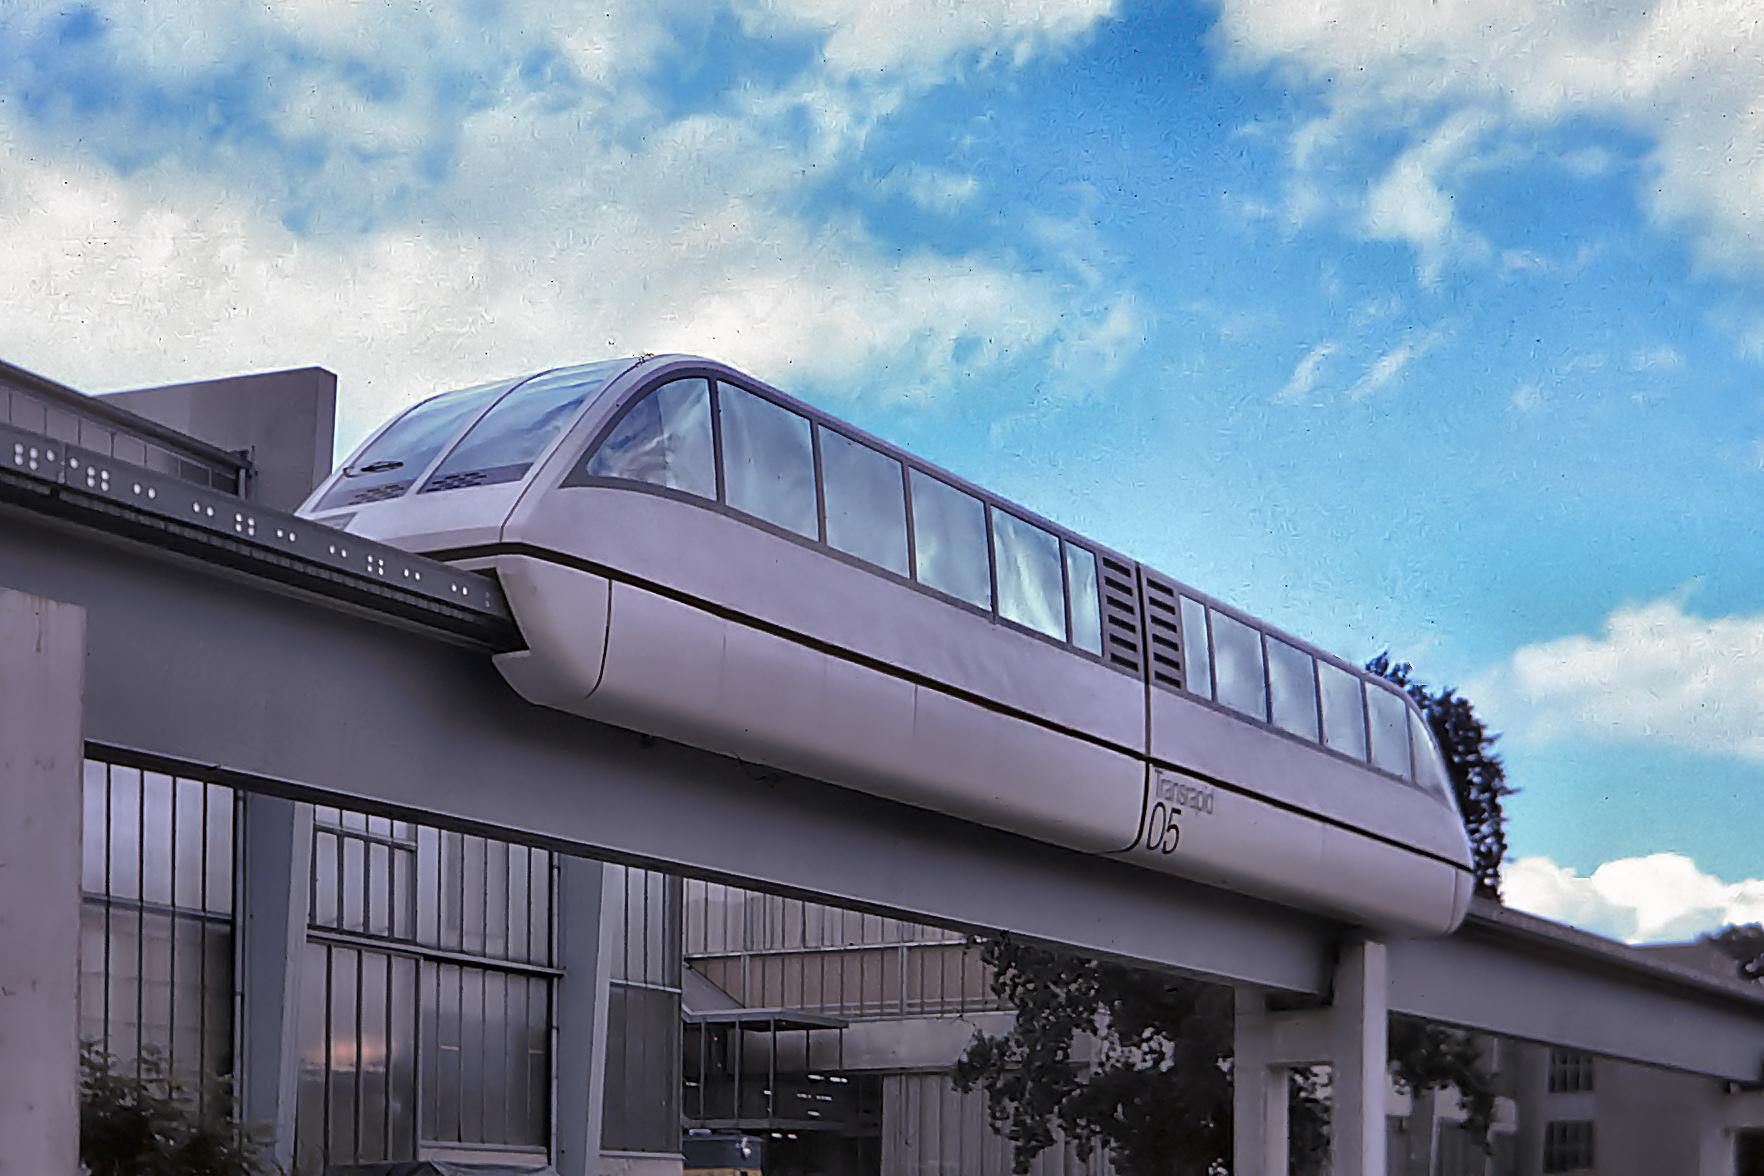 Transrapid 05 at ThyssenKrupp